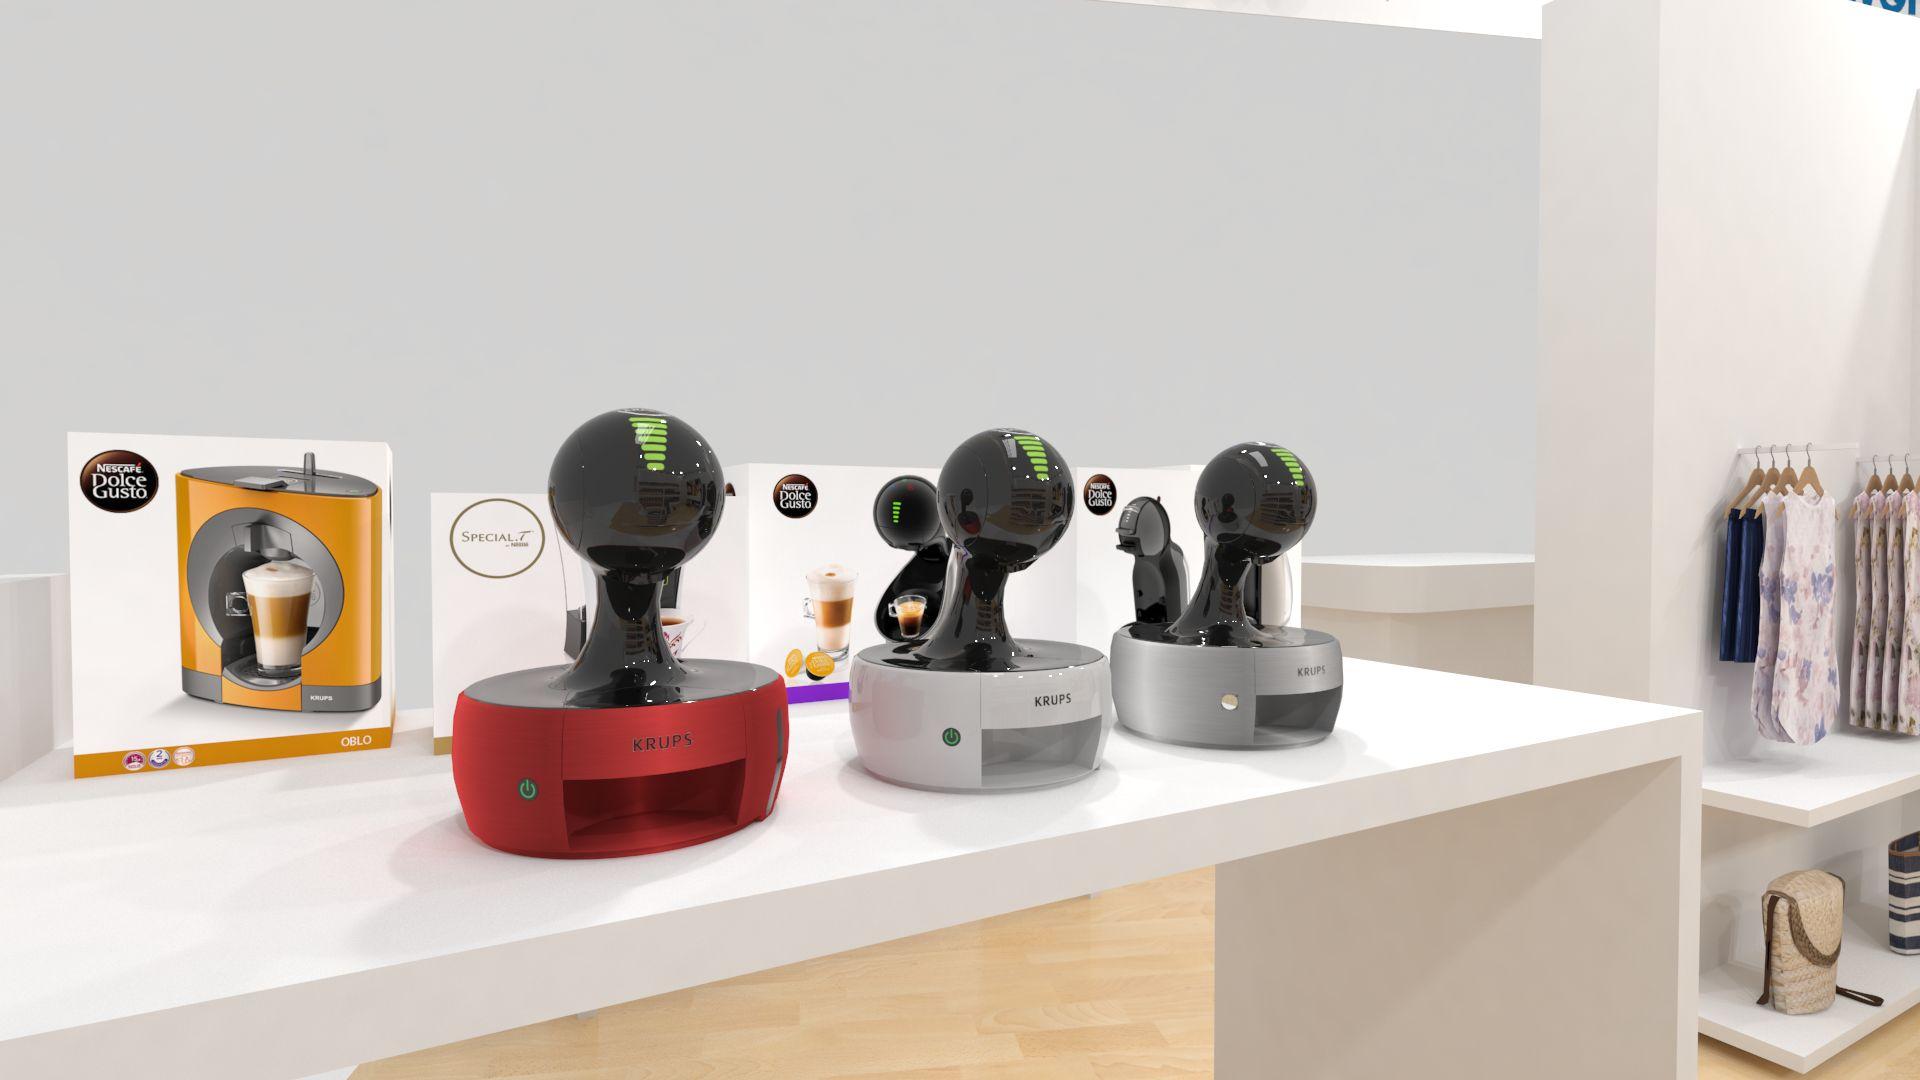 Atos VR Store